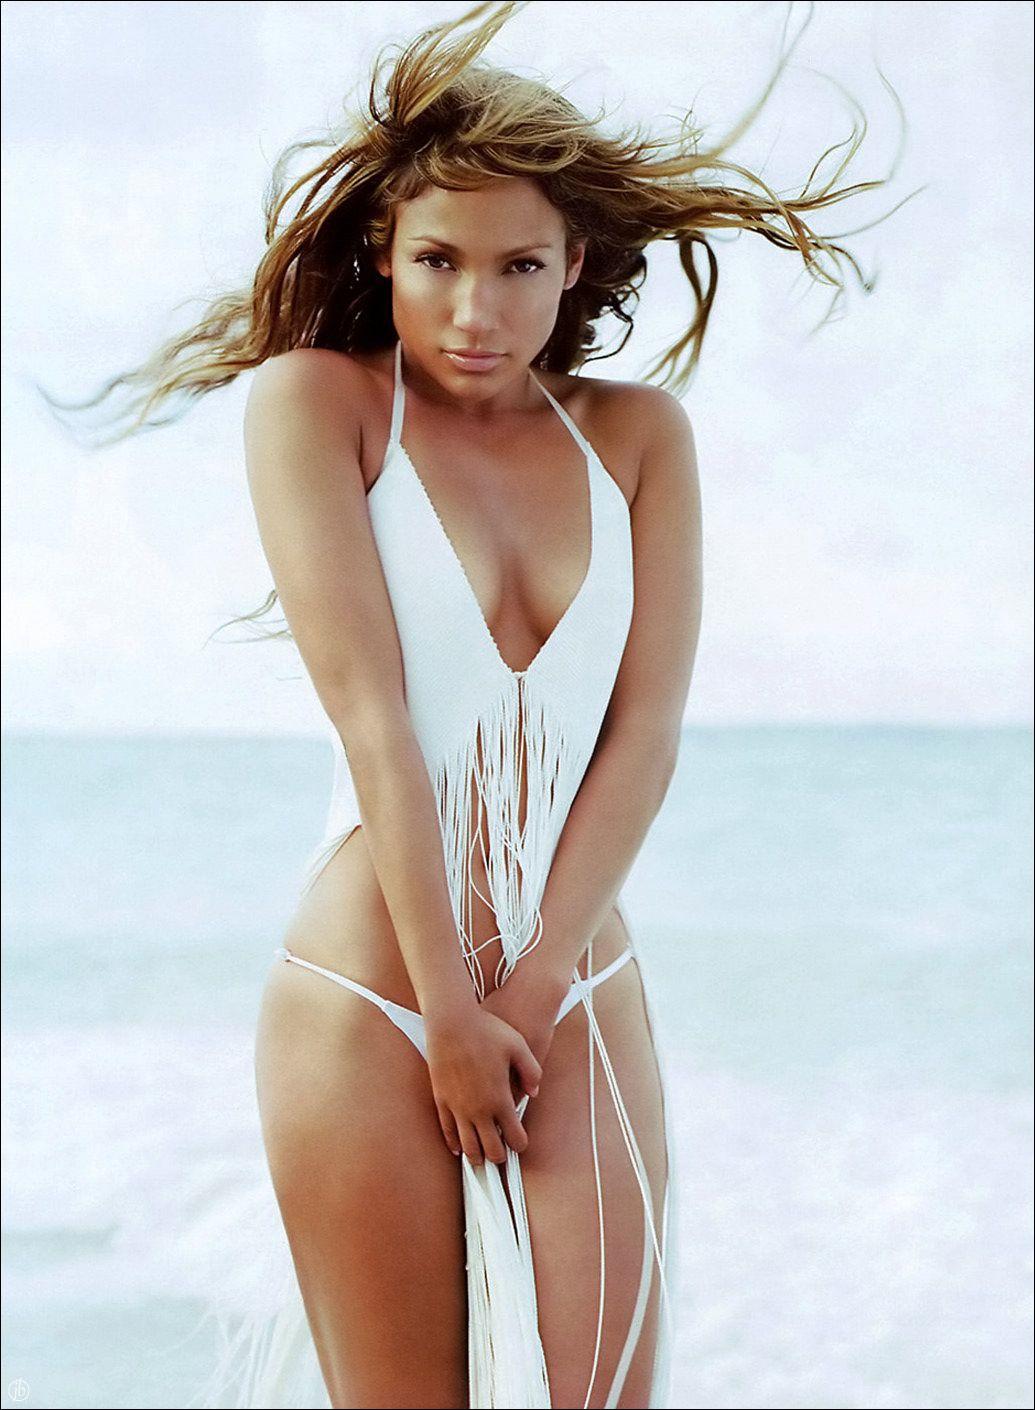 Jennifer Lopez Photo, Pics, Wallpaper - Photo 106669 -2887